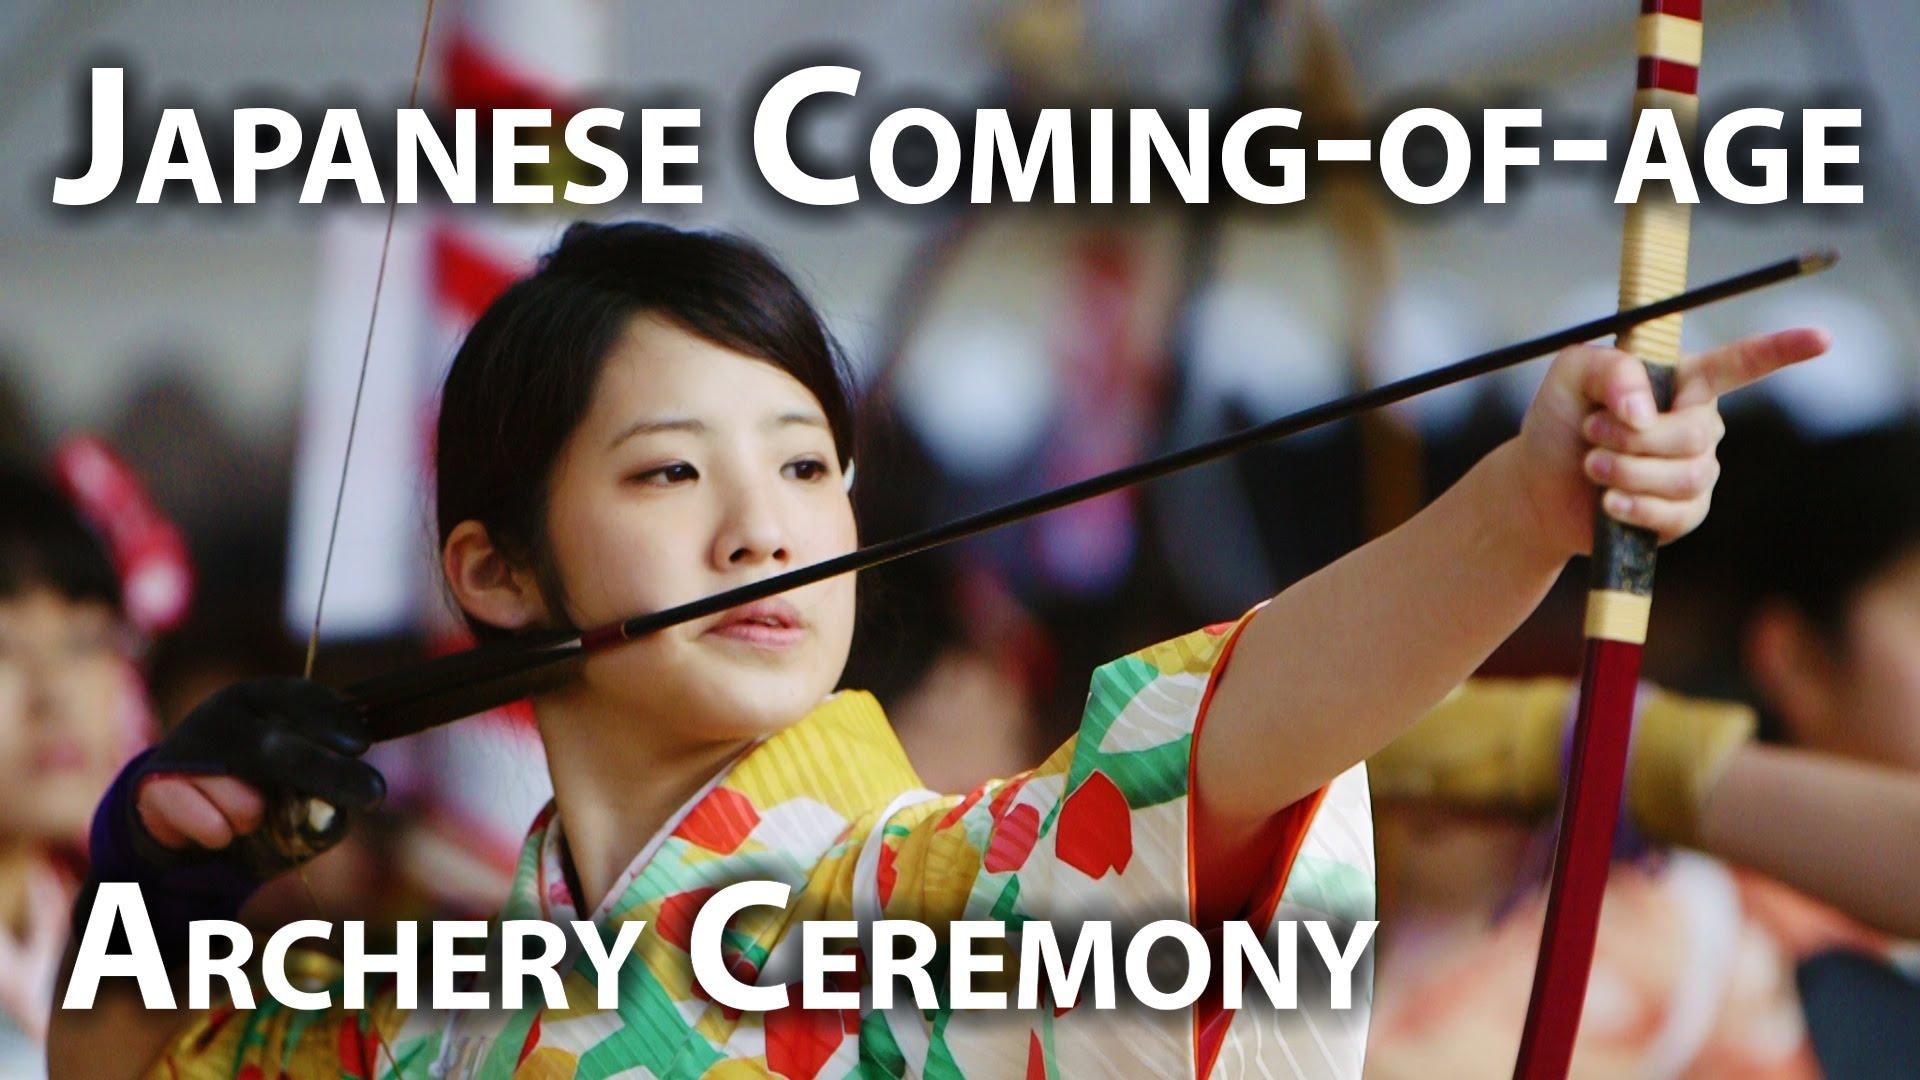 Japanese girls in Archery Ceremony